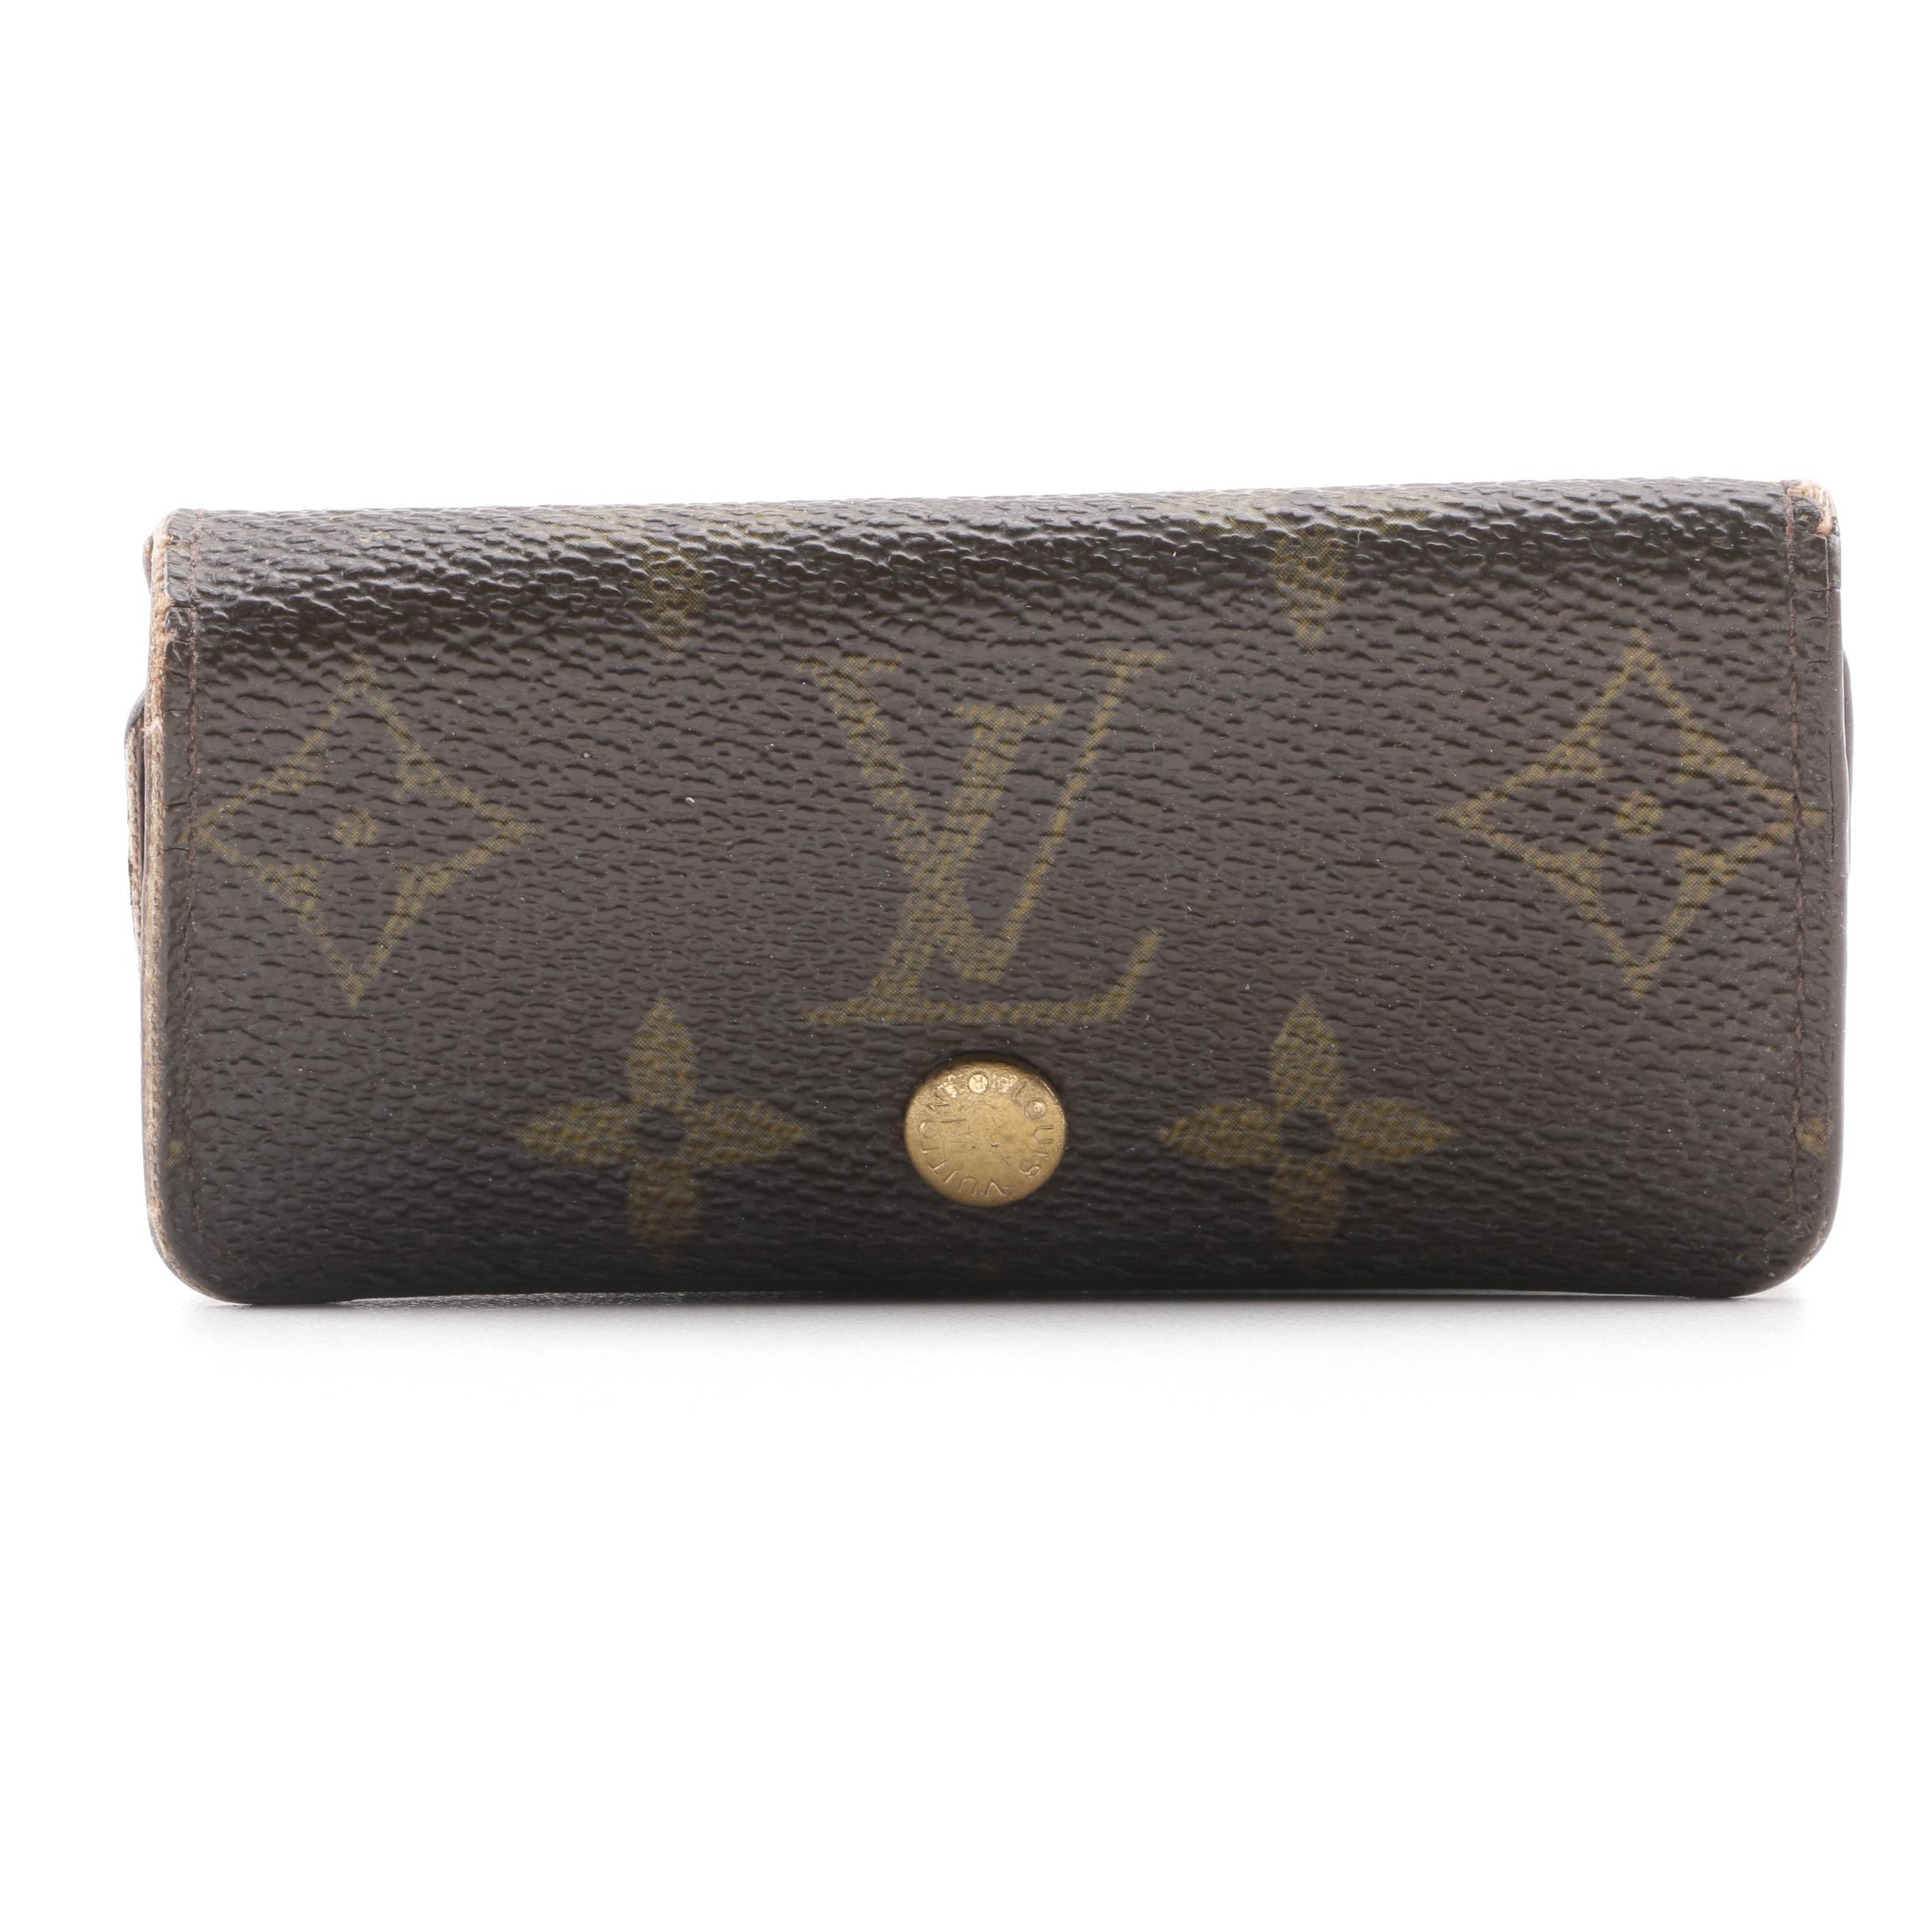 2006 Louis Vuitton Monogram Canvas 4 Key Holder